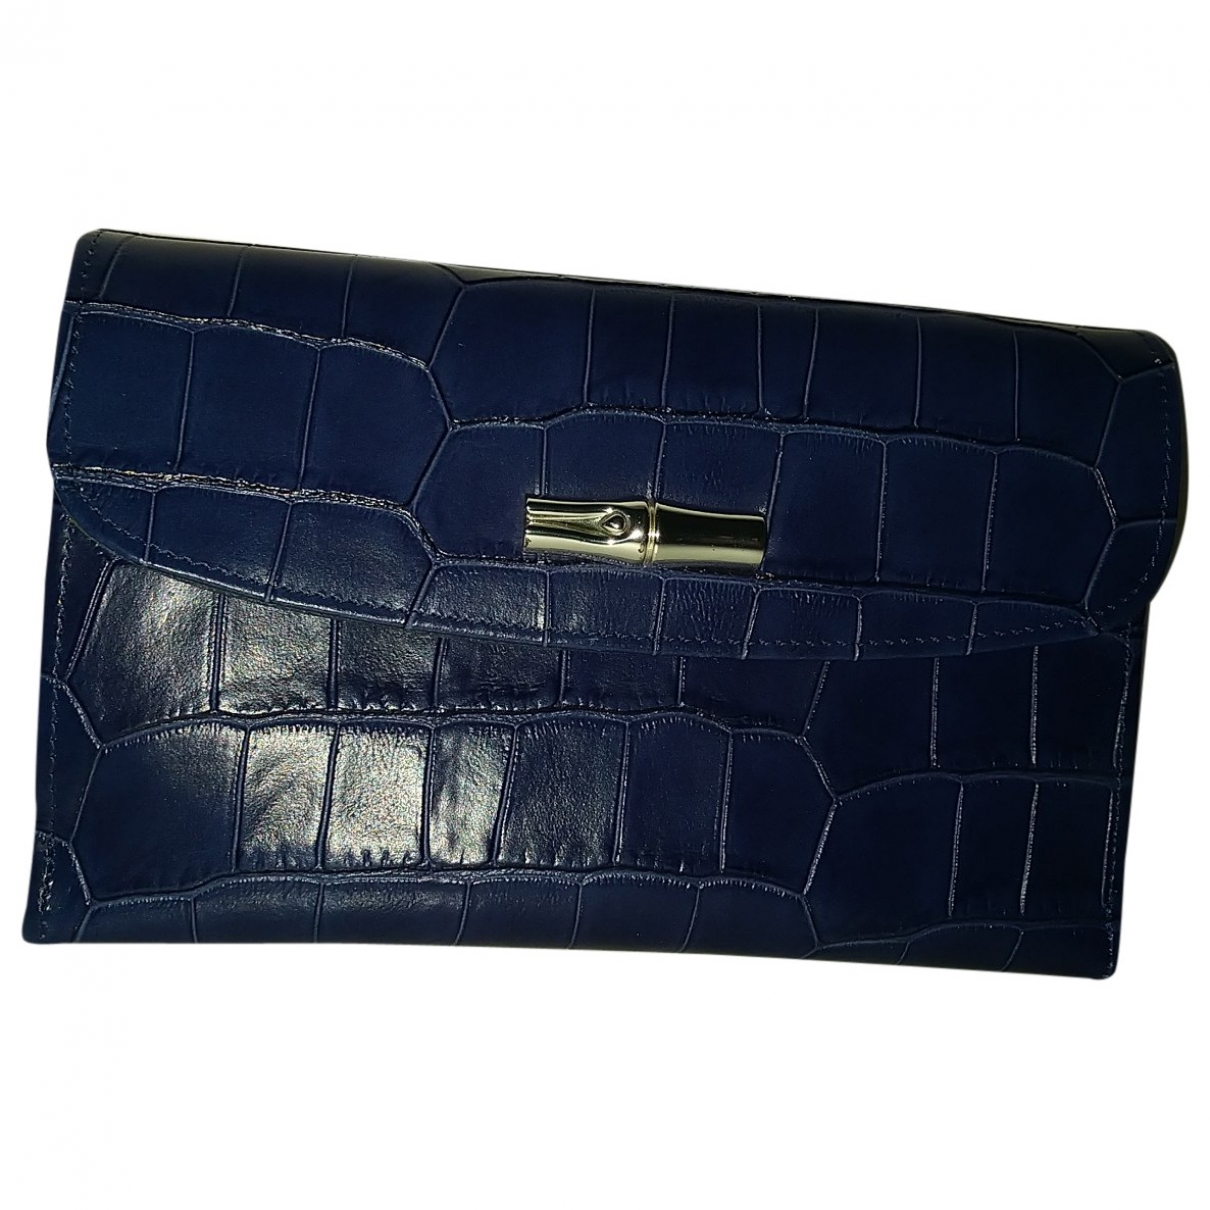 Longchamp \N Blue Leather wallet for Women \N